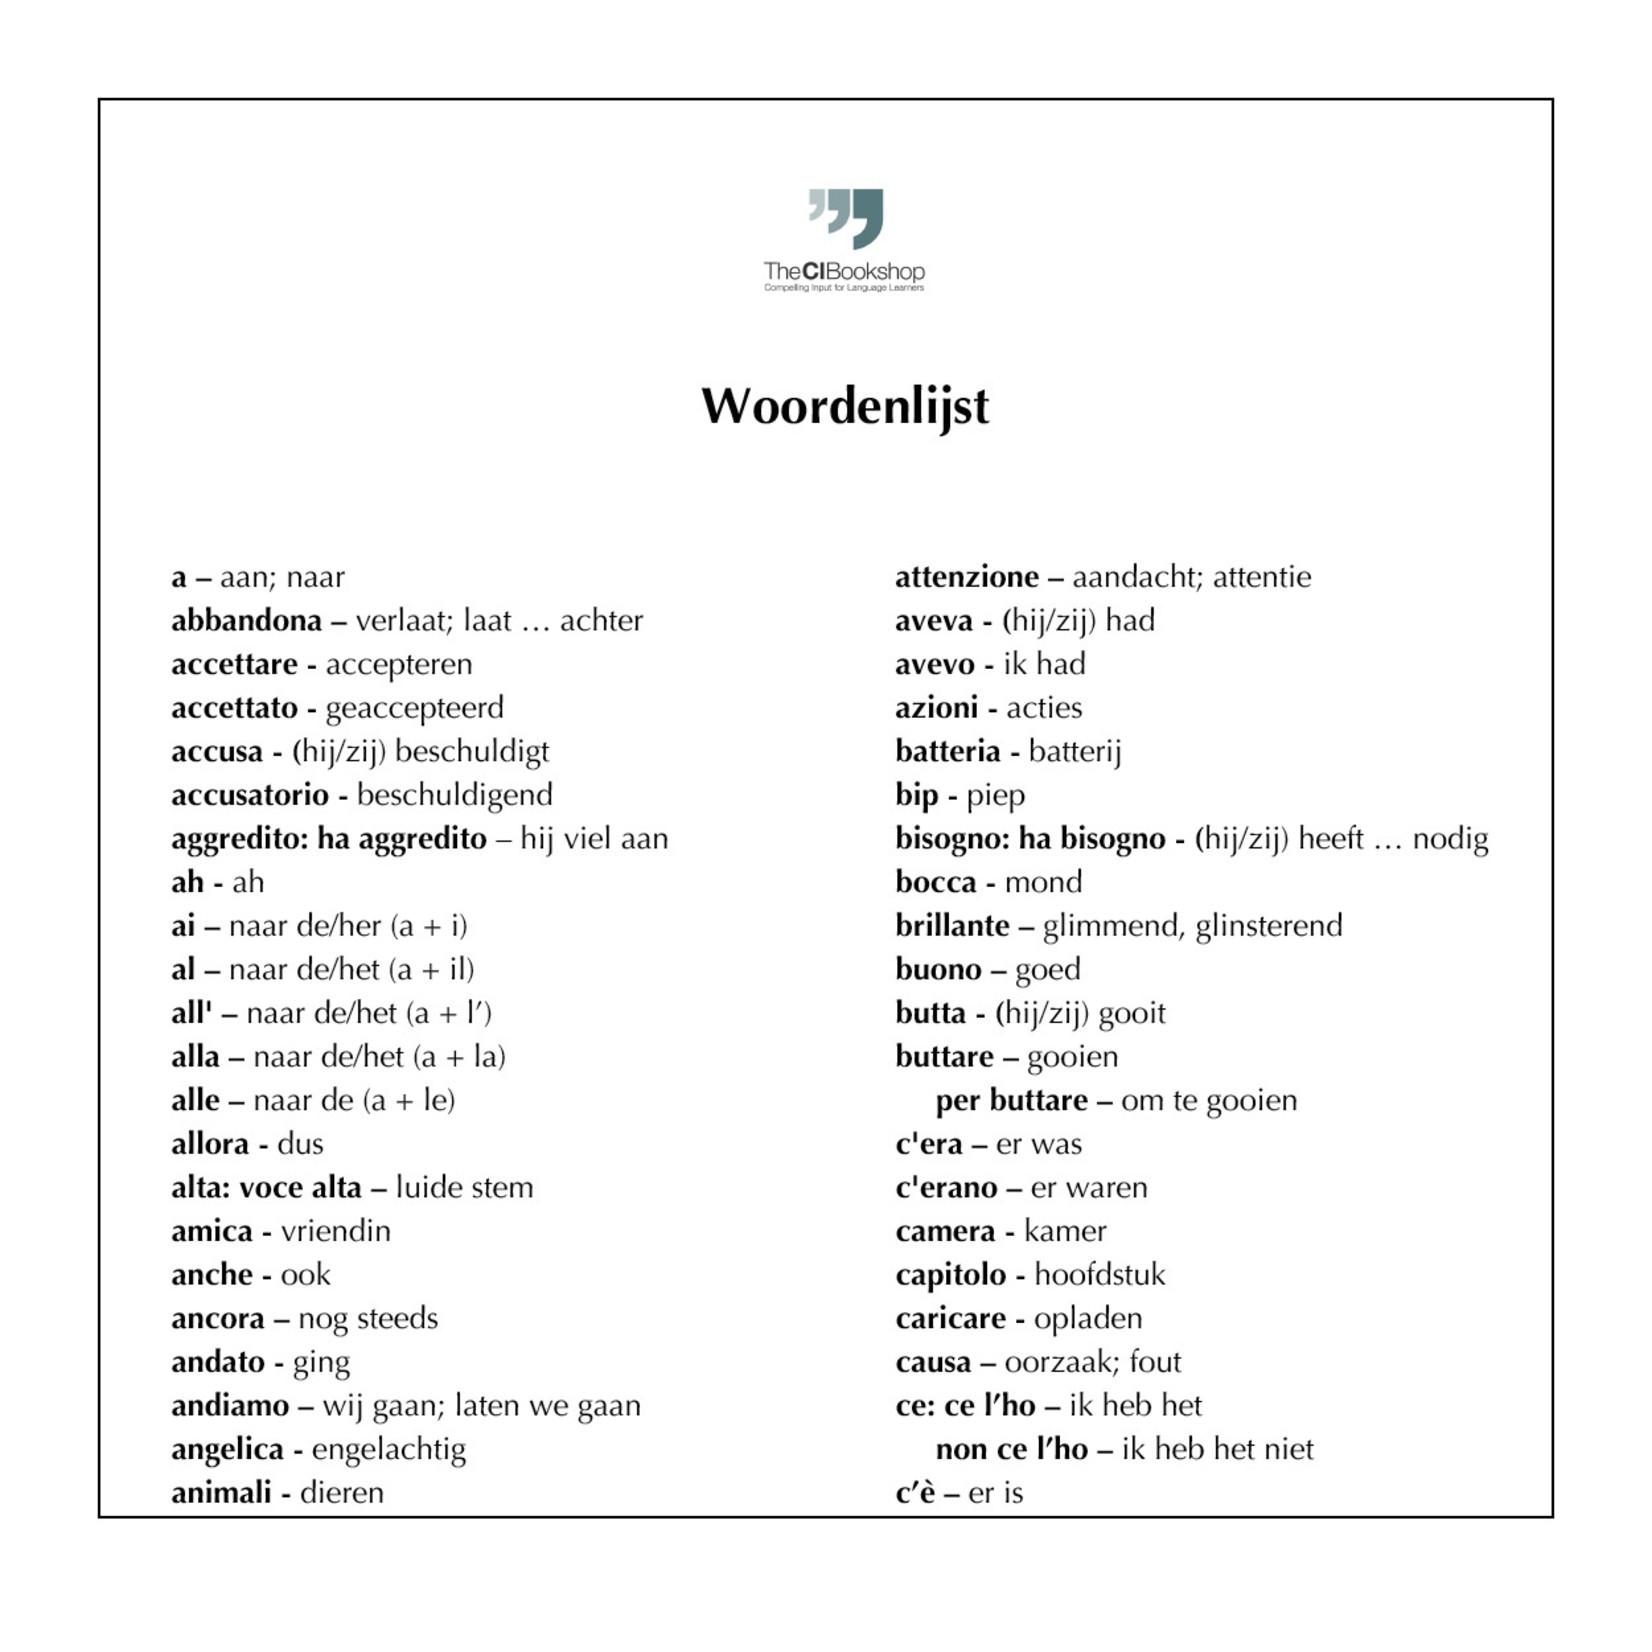 Dutch glossary for Povera Anna